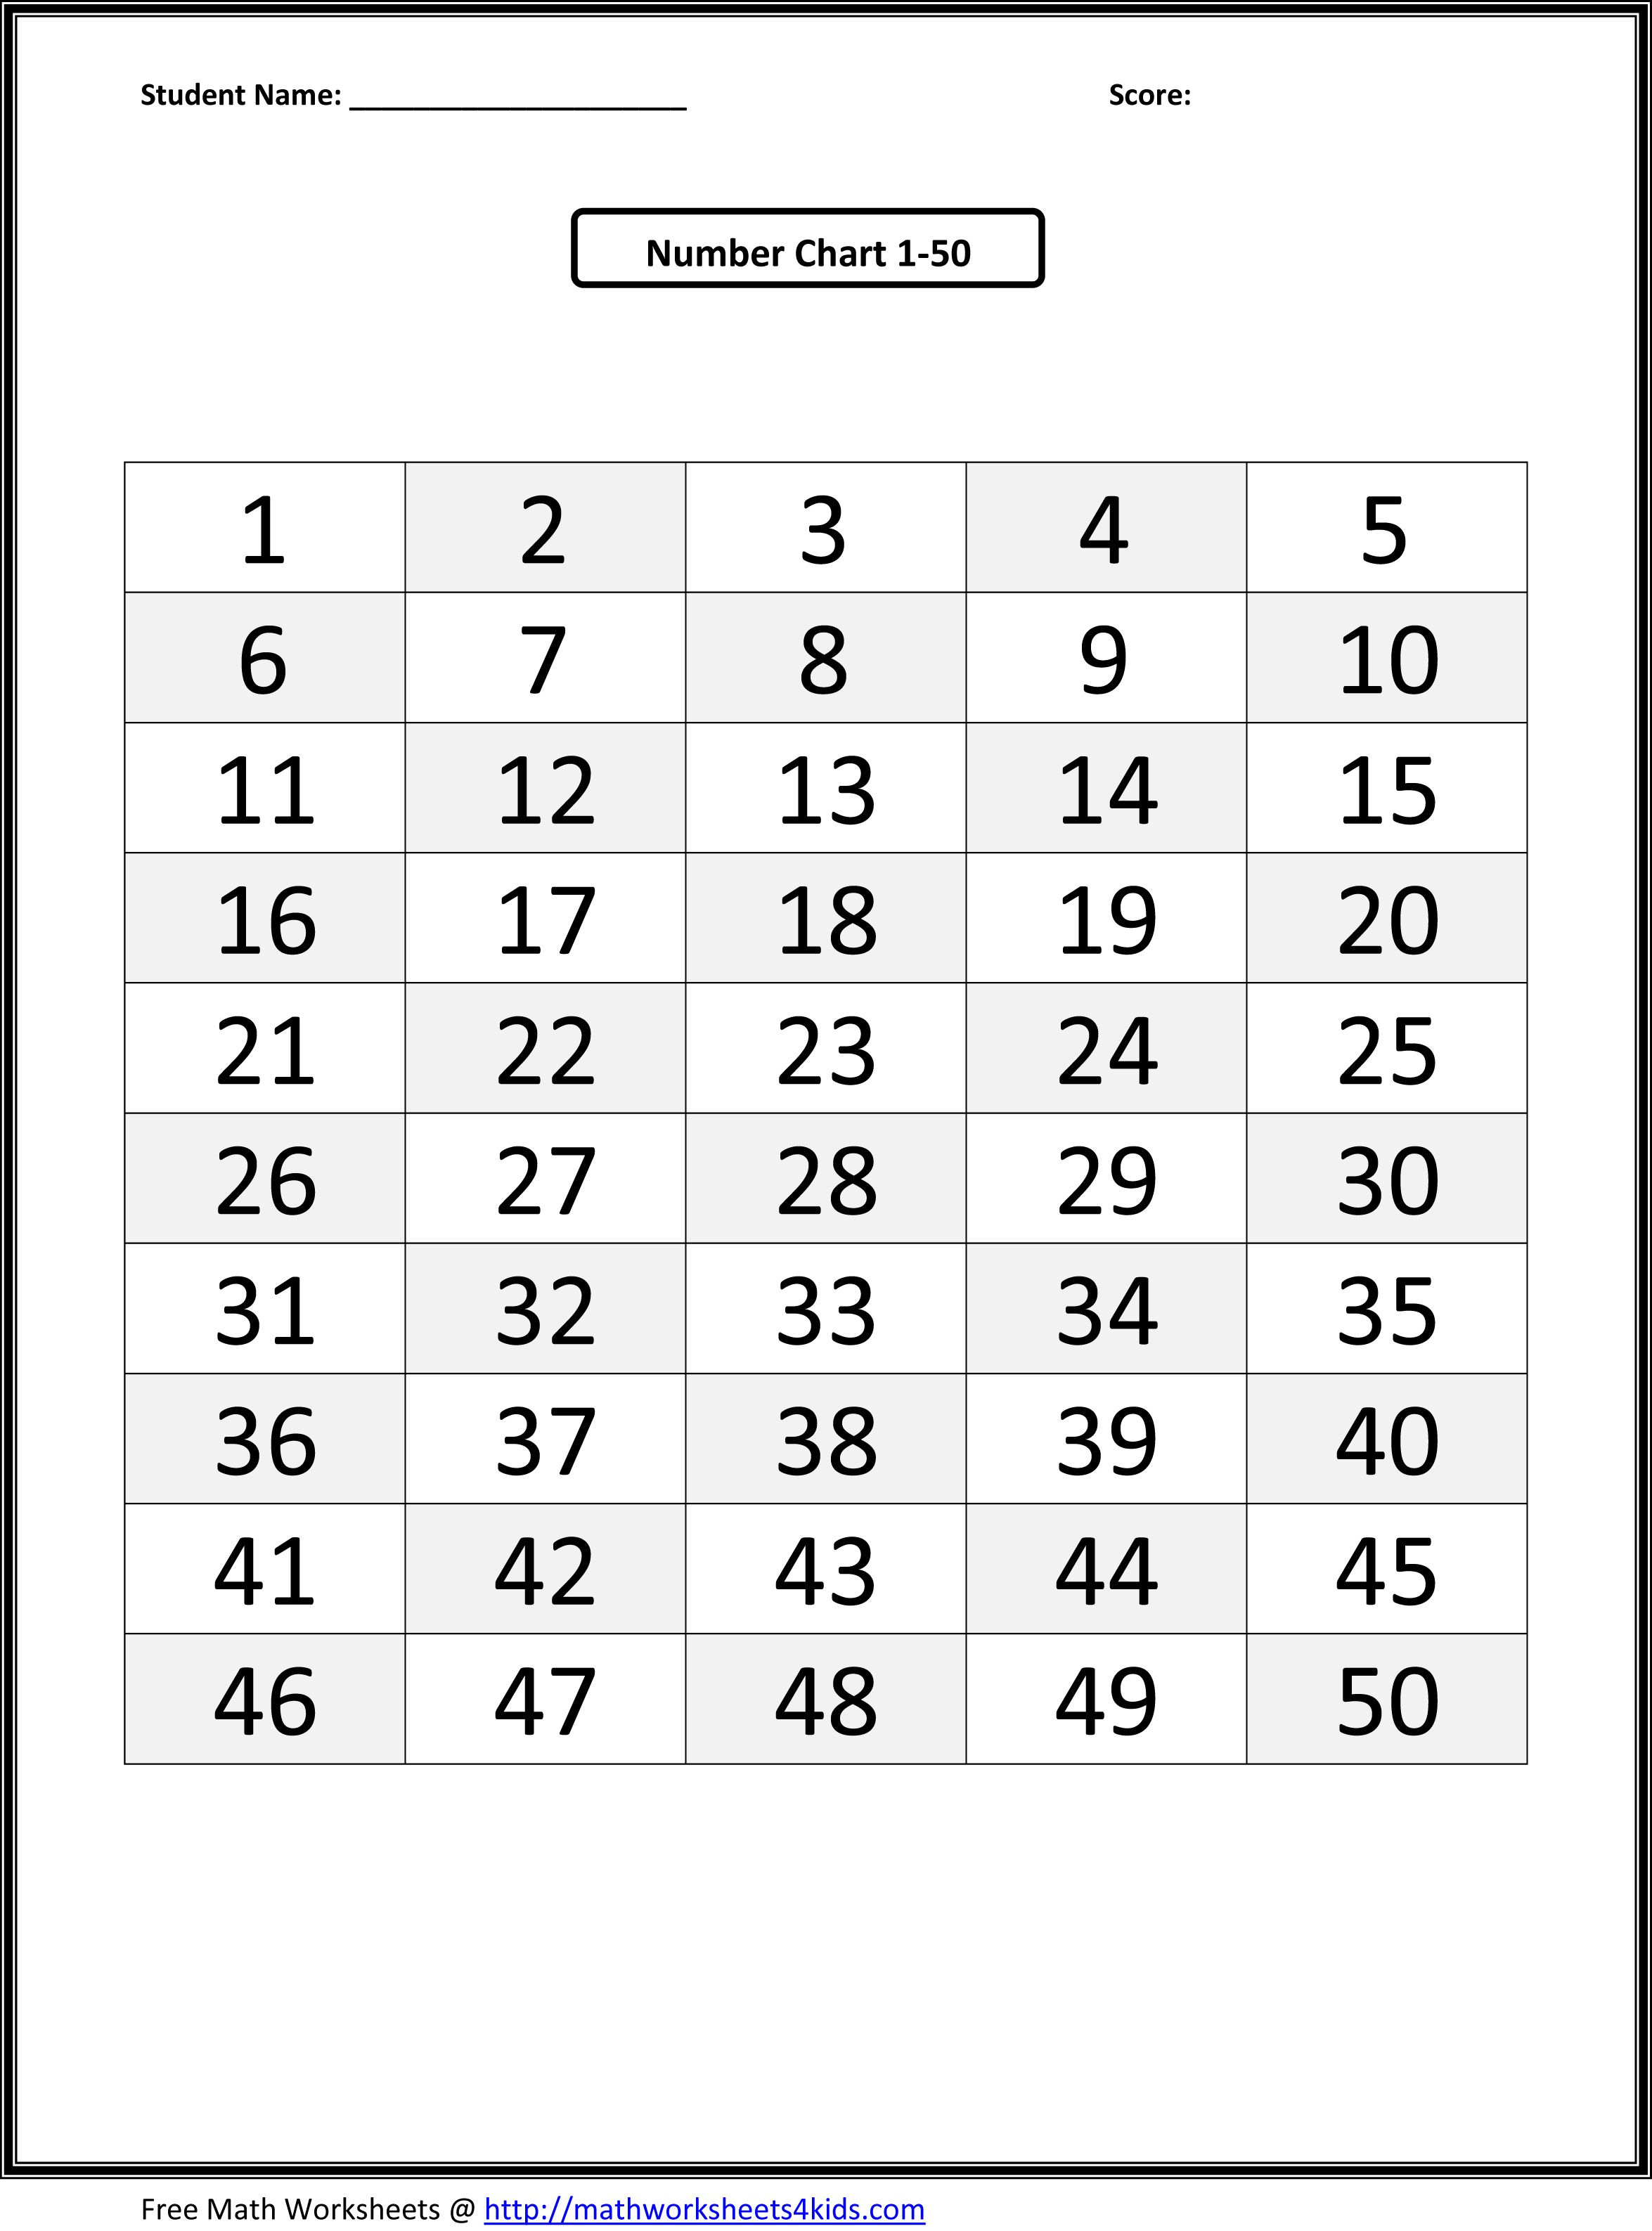 Mathworksheets4Kids Free Math Printable Worksheets Website | Printable Math Worksheets Www Mathworksheets4Kids Com Answers